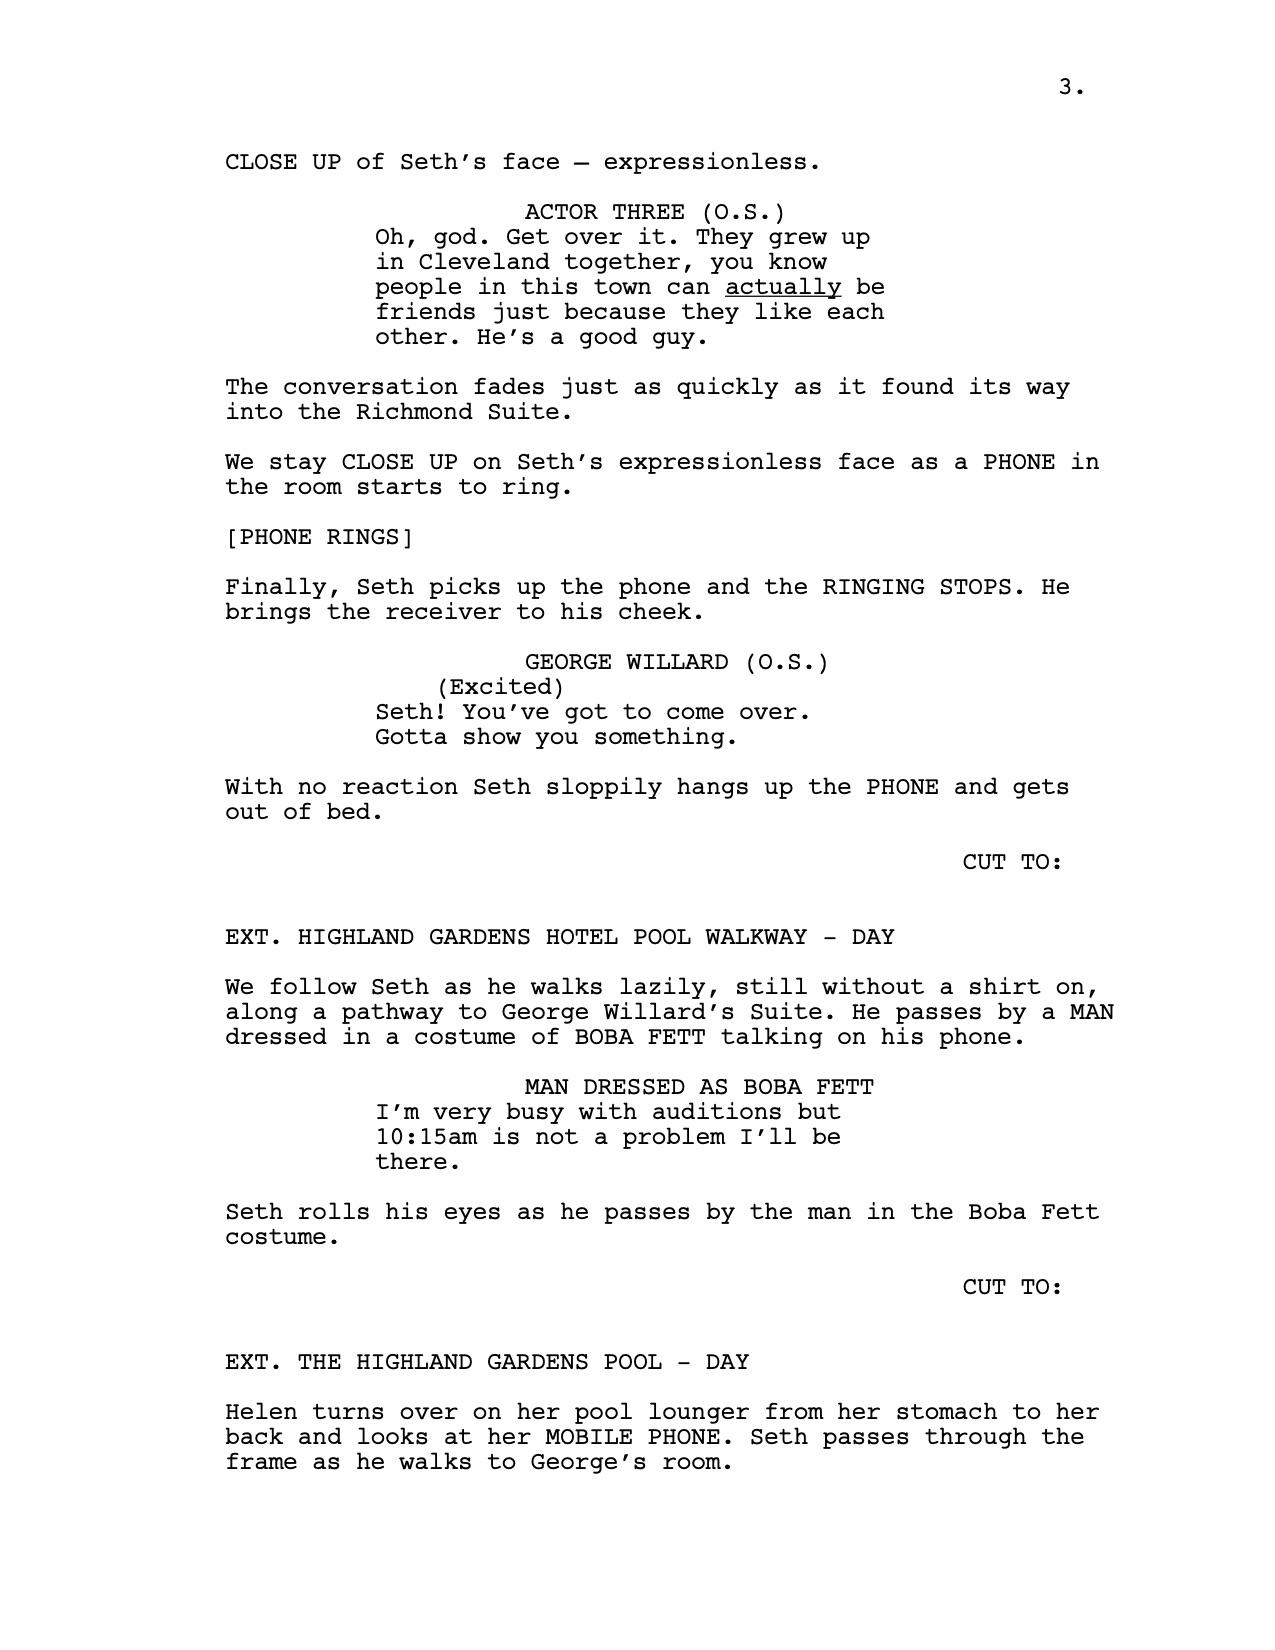 Page-3-DavidLook-TheGardens-1